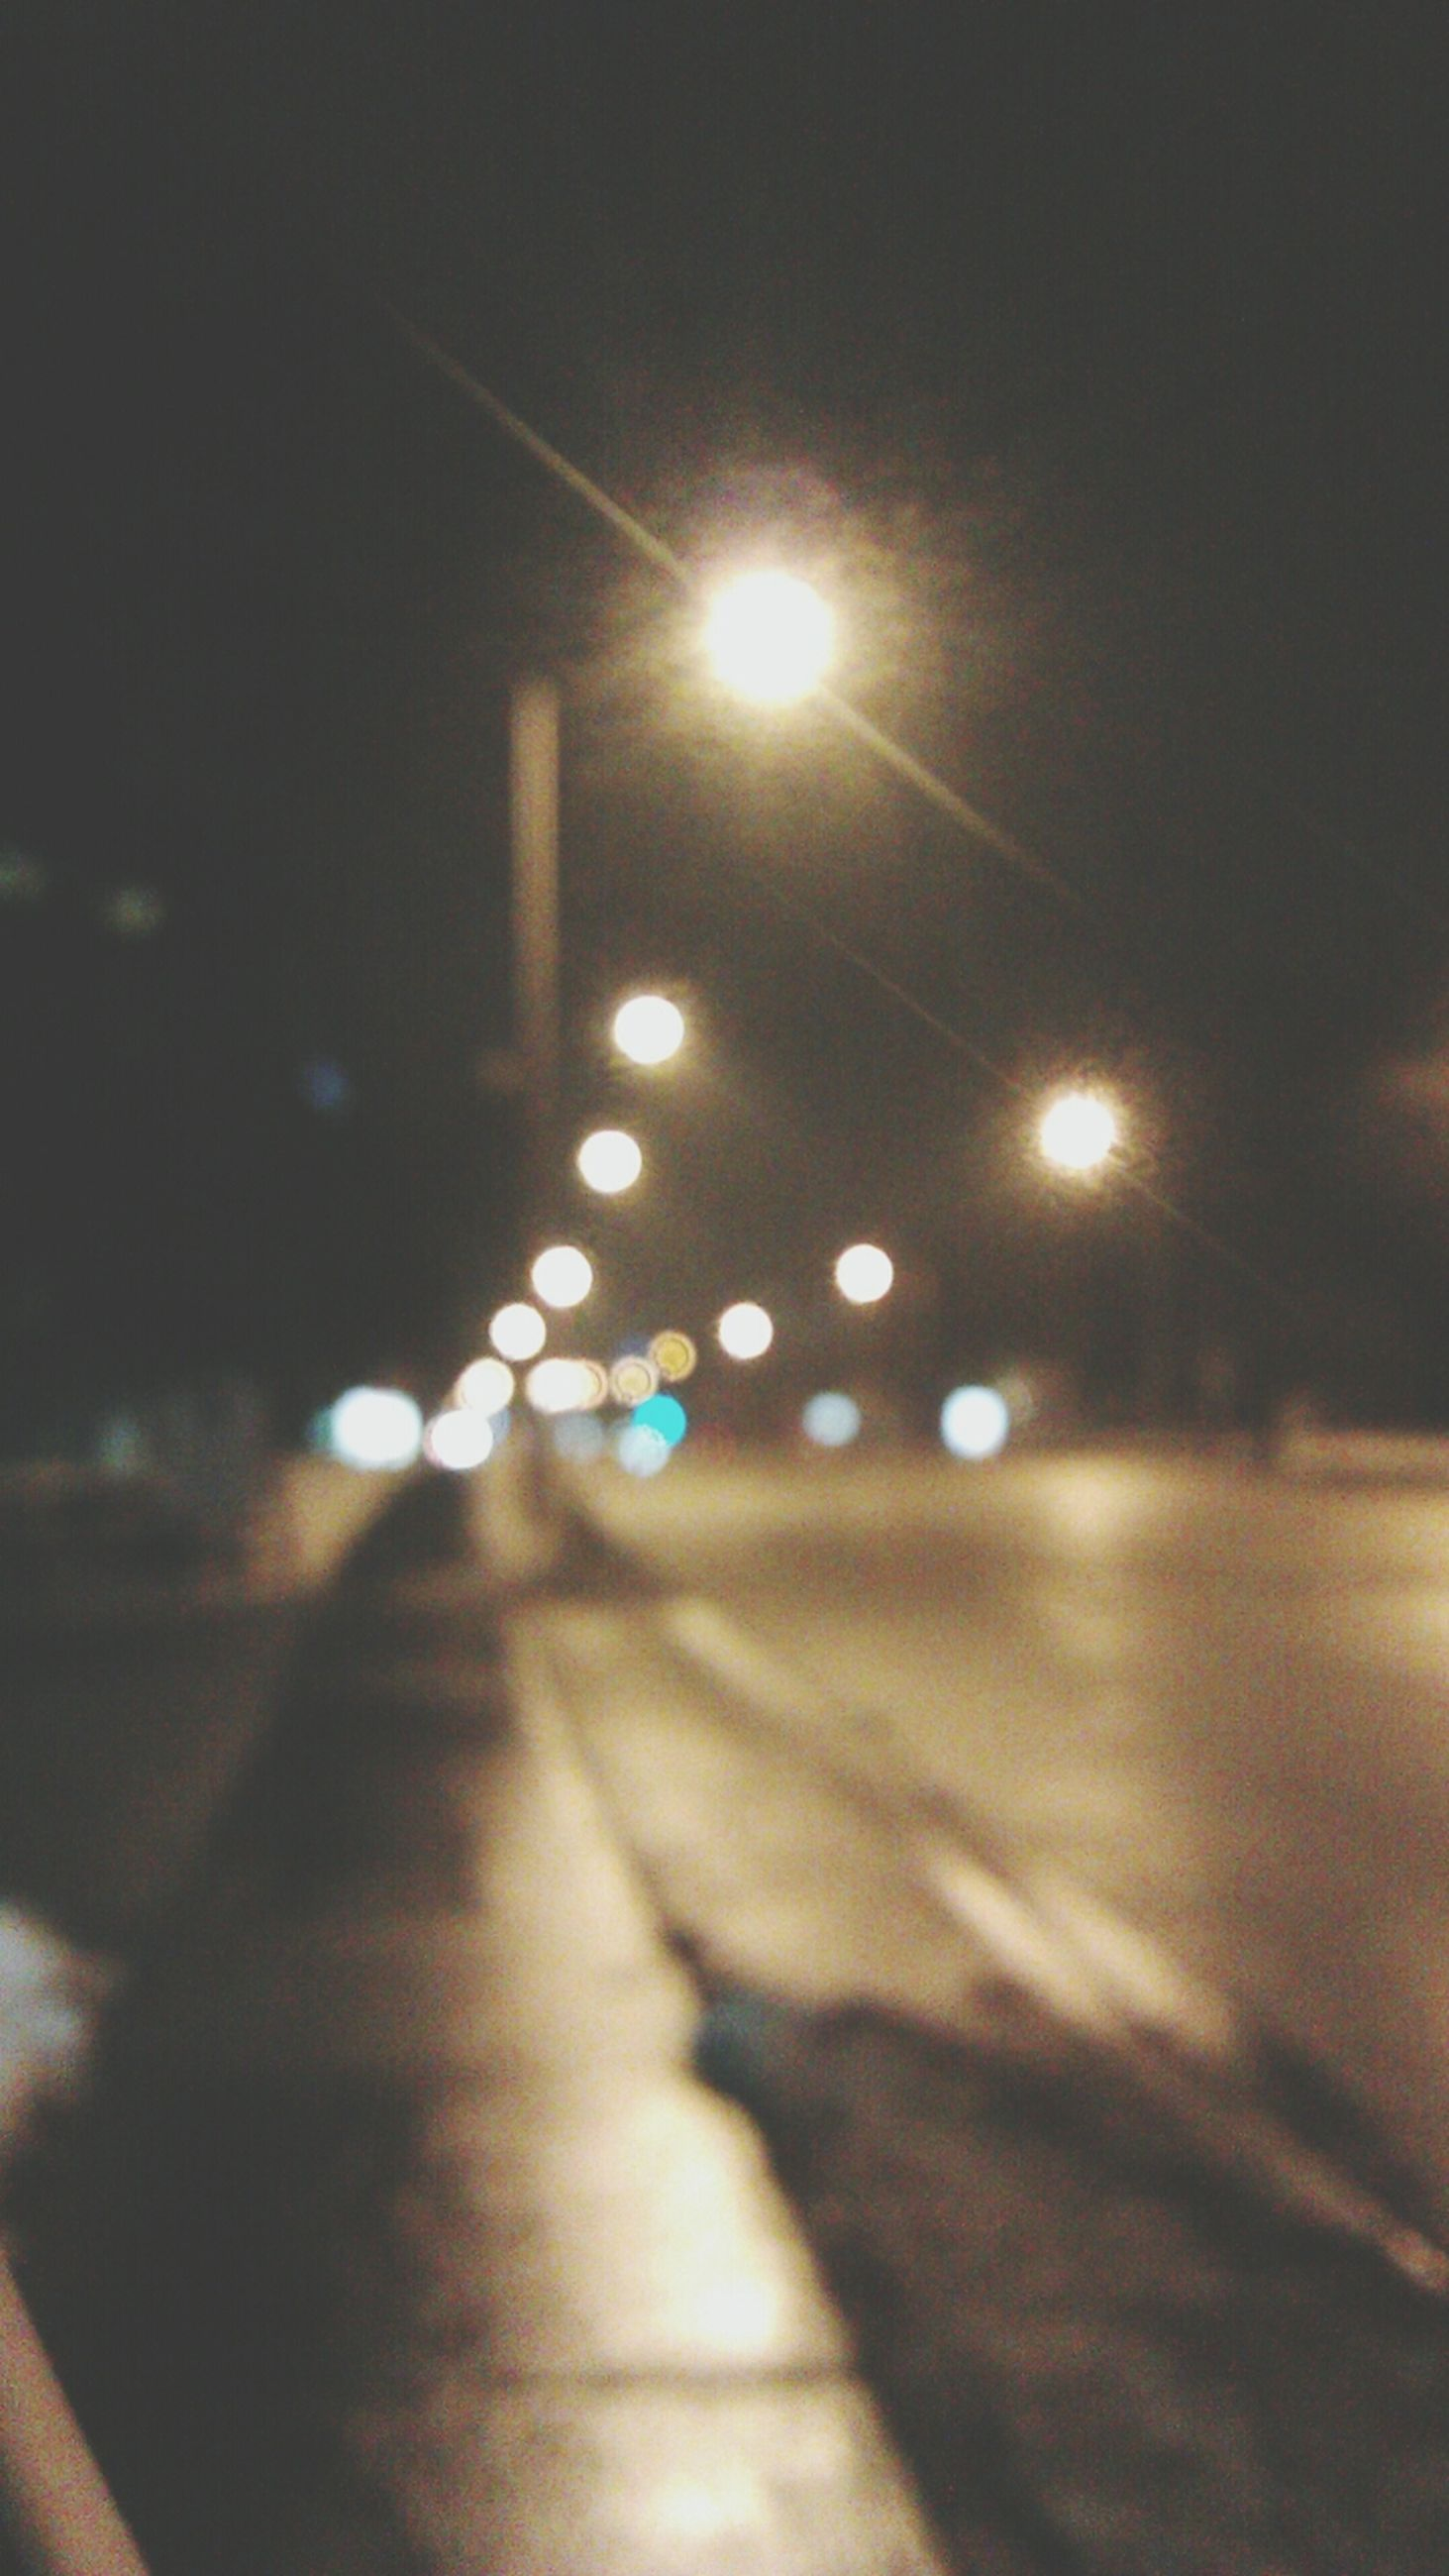 illuminated, night, transportation, street, lens flare, road, defocused, car, land vehicle, lighting equipment, focus on foreground, sunlight, no people, outdoors, light - natural phenomenon, mode of transport, shadow, street light, close-up, selective focus